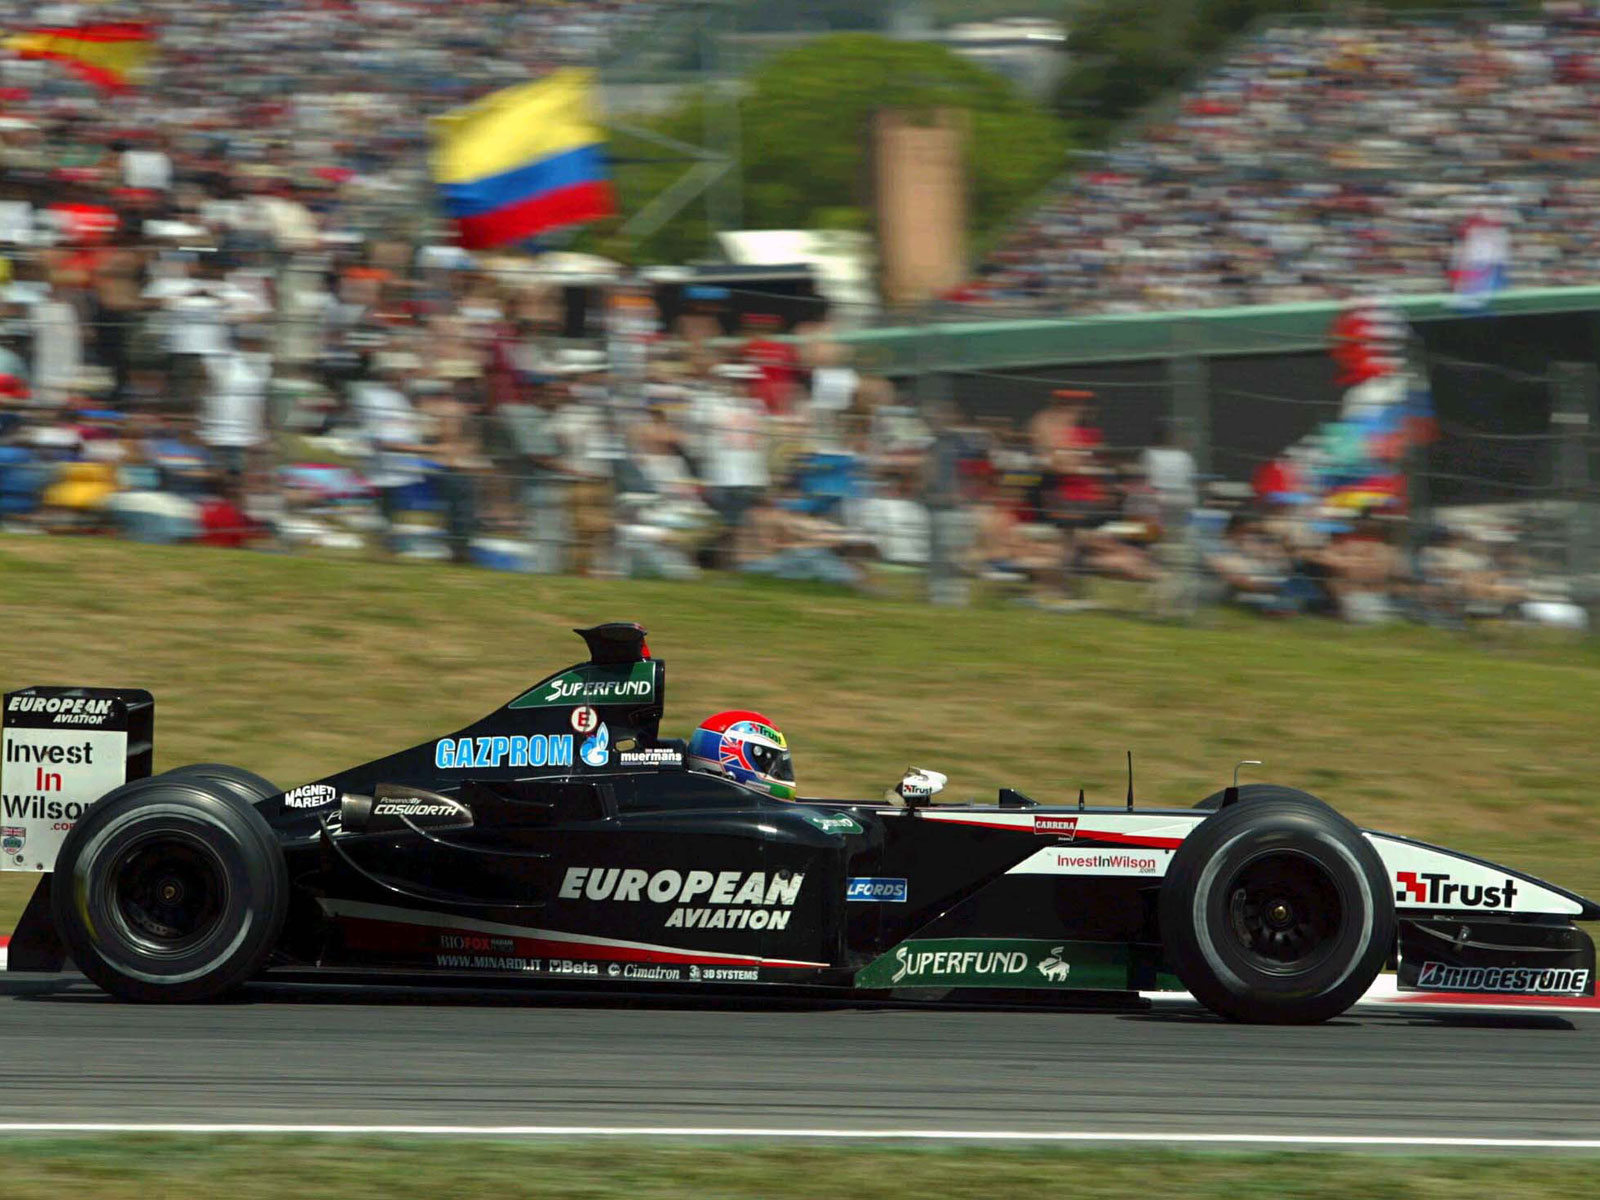 F1 2003